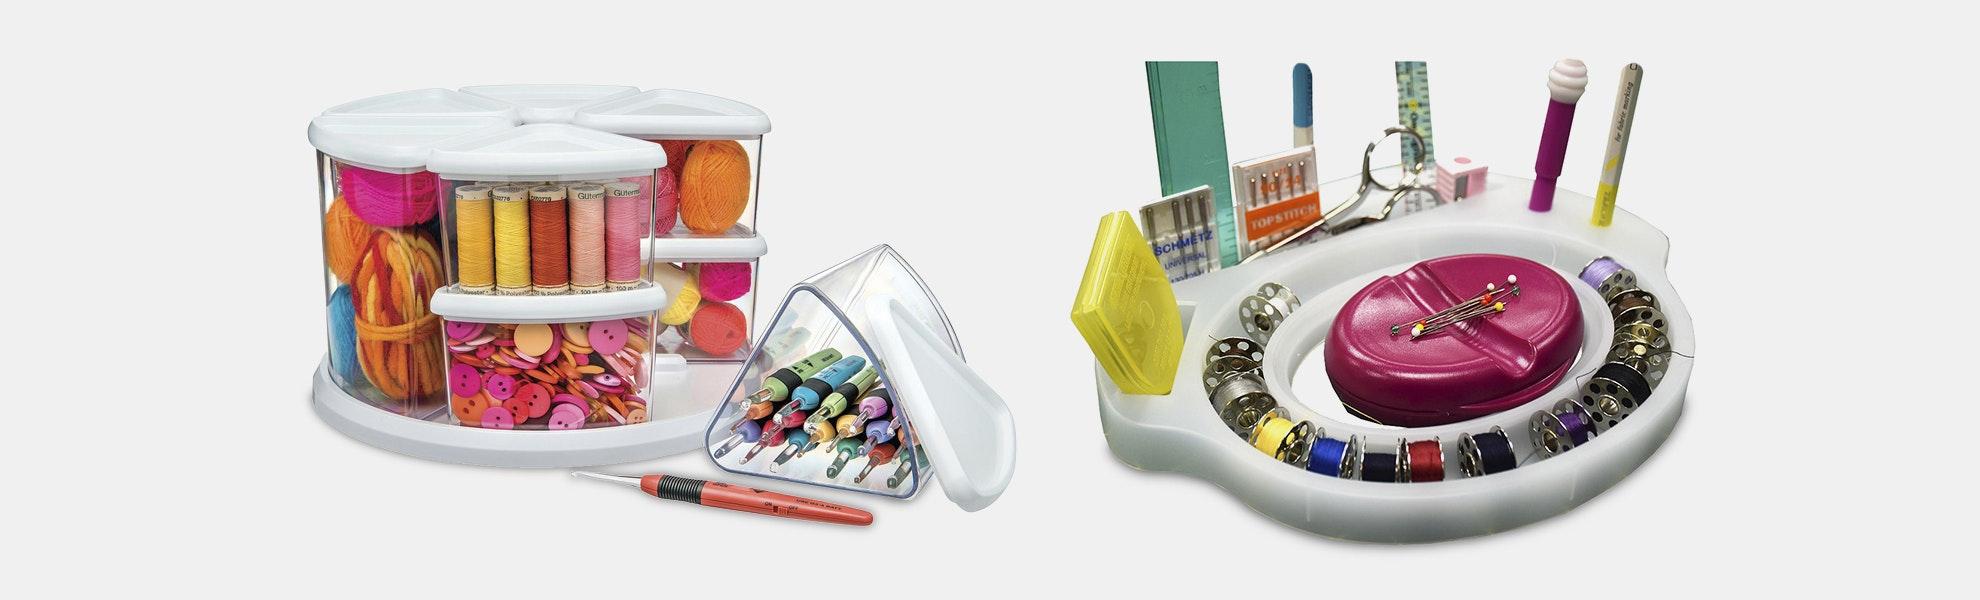 Sewing Notions Organization Kit